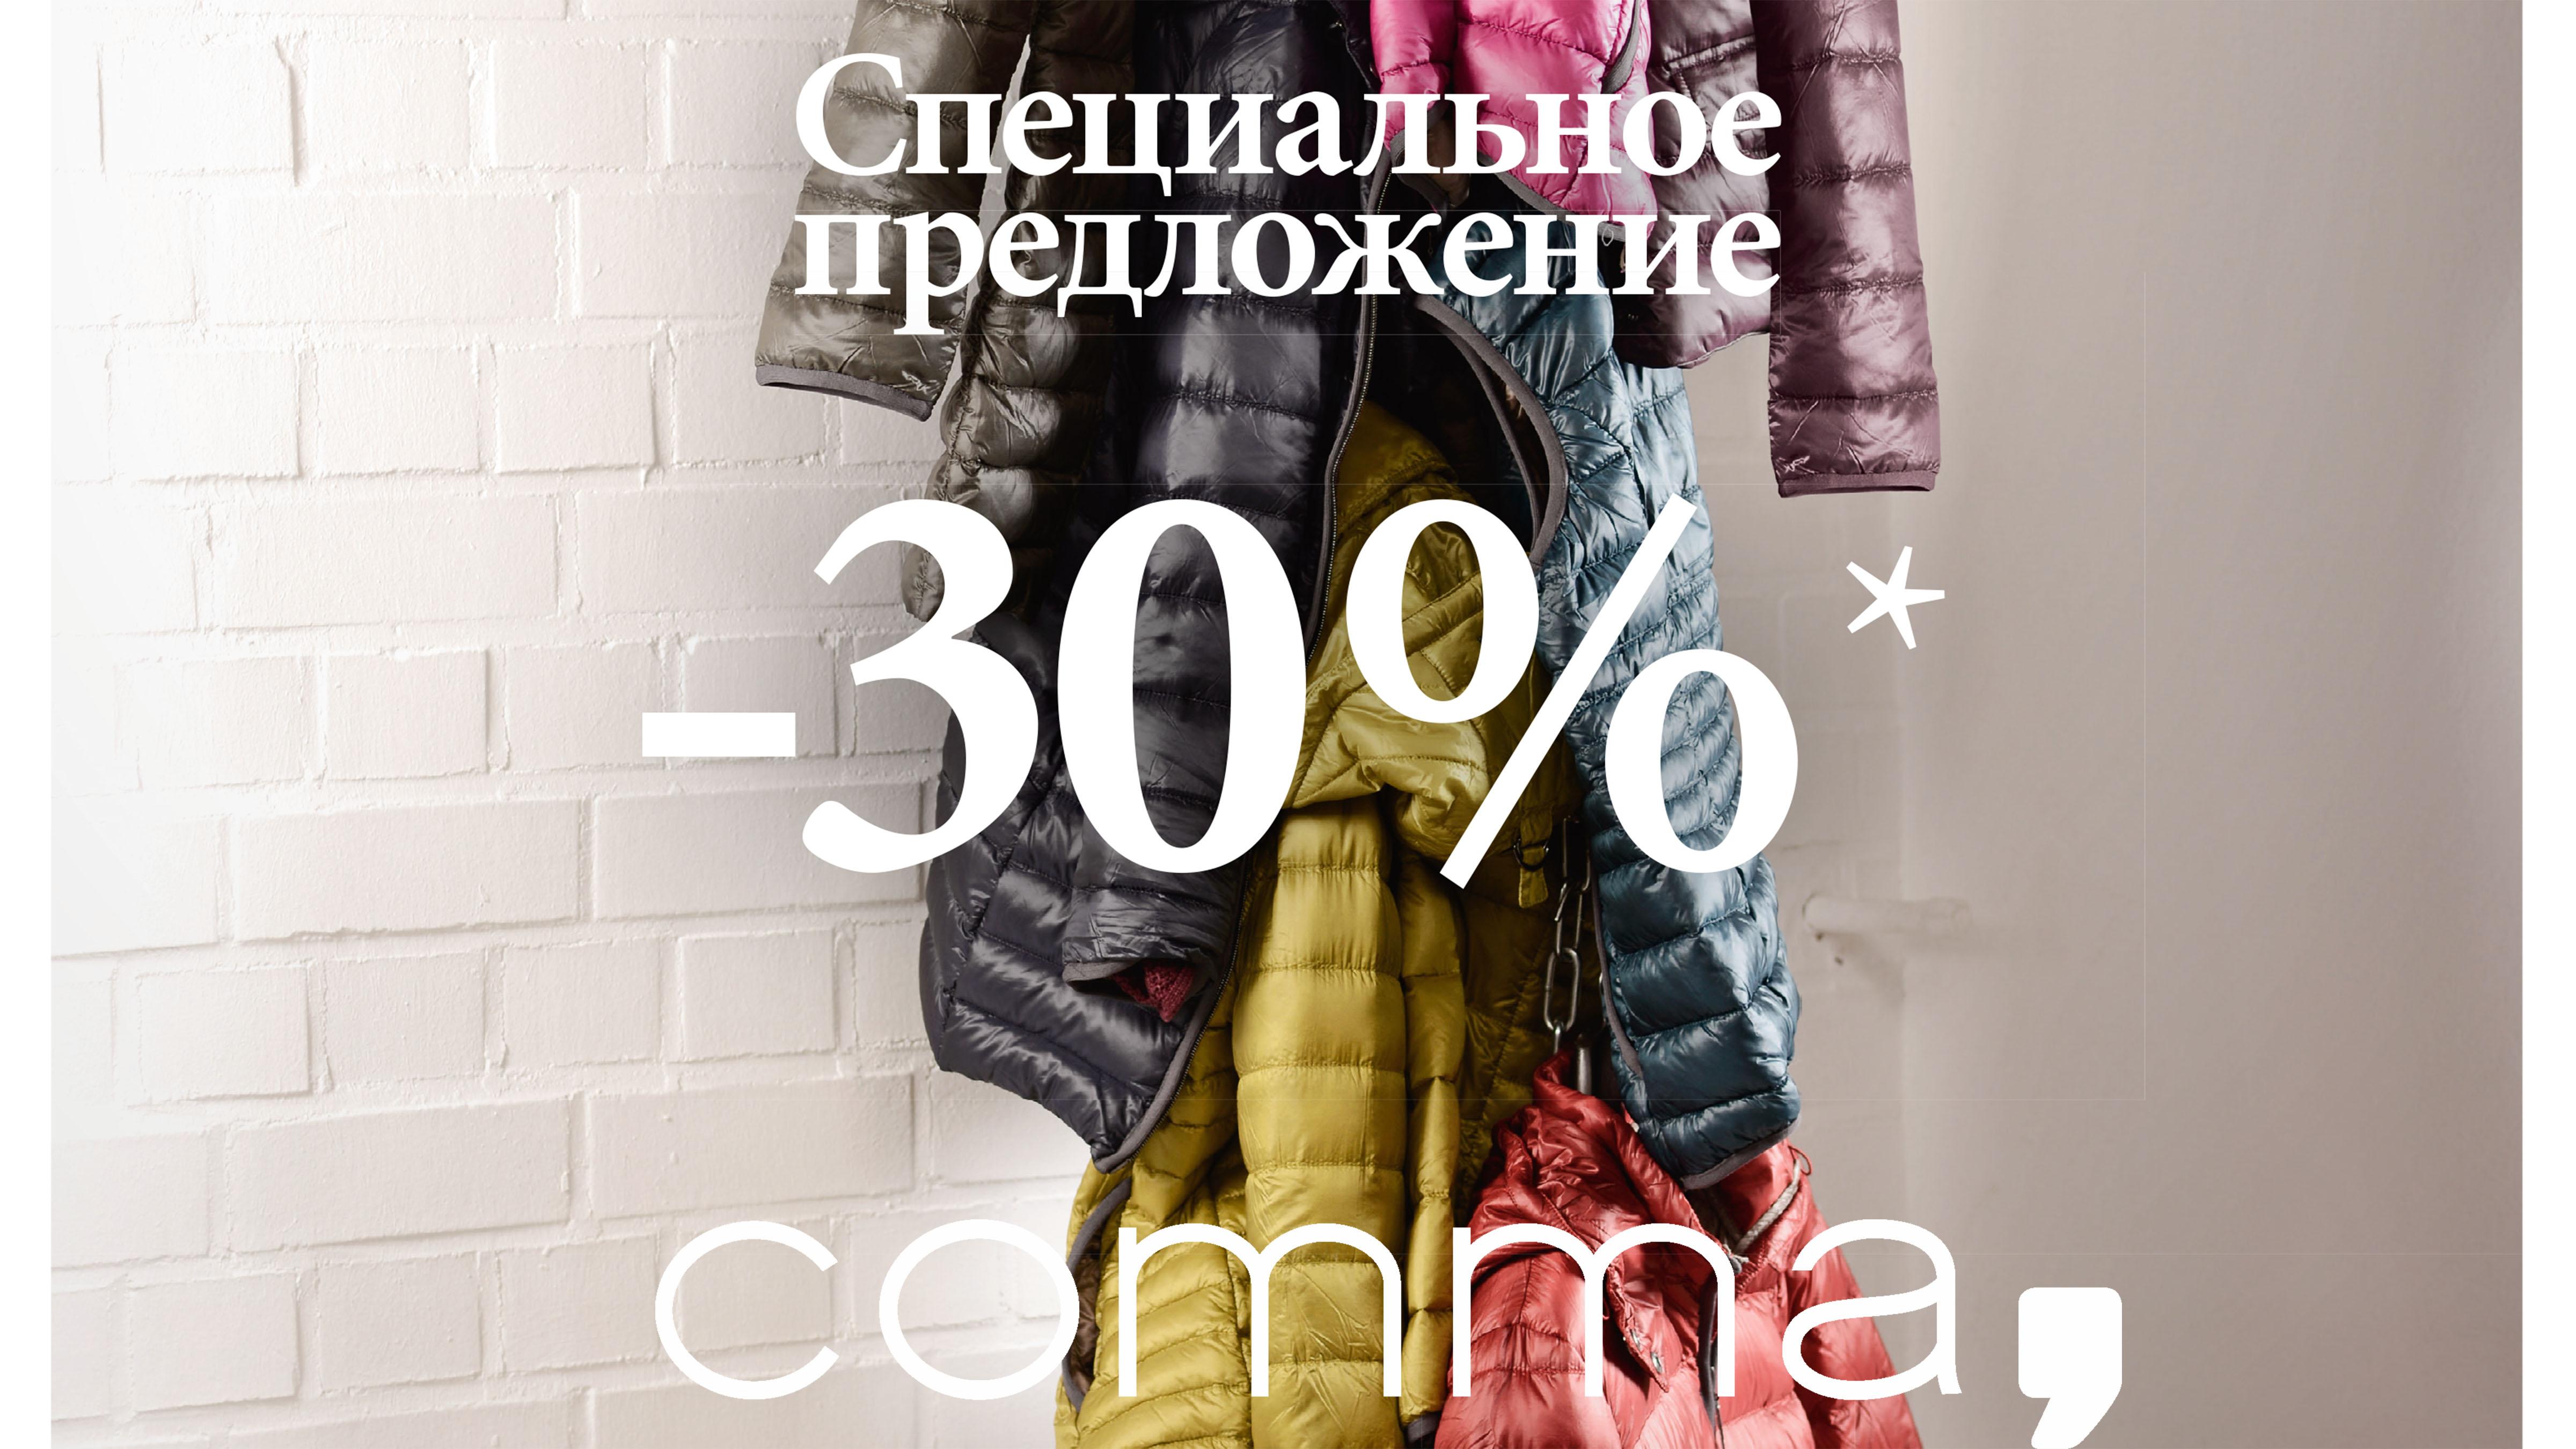 1410 RU FR 1015 TM14 600 Tools Aufsteller 25x32 Krasnojarsk lay0